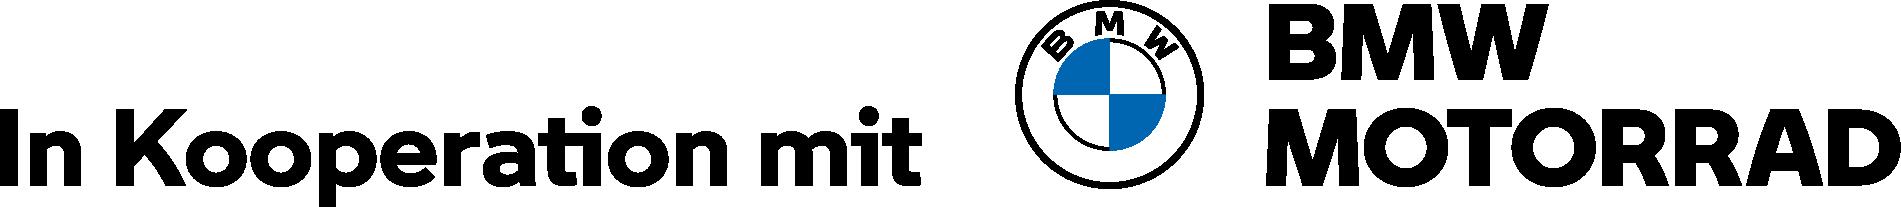 In_Kooperation_mit_BMW_Motorrad_Logo